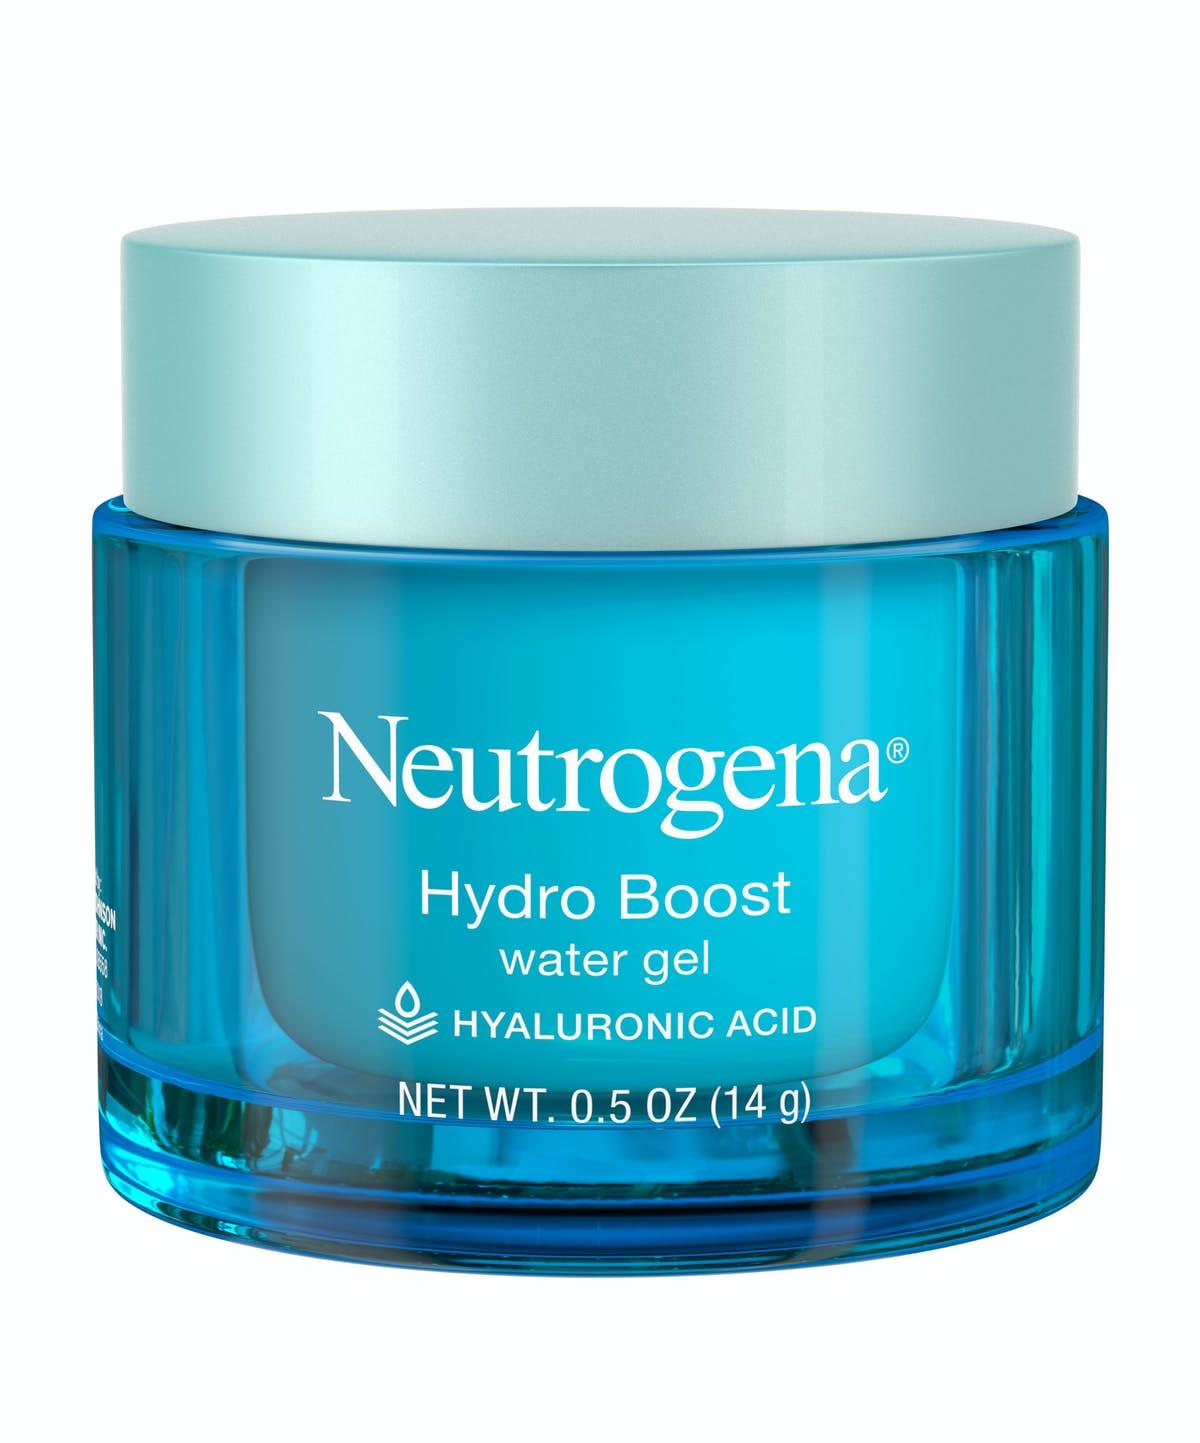 kem dưỡng ẩm Neutrogena Hydro Boost Hyaluronic Acid Hydrating Water Face Gel Moisturizer.